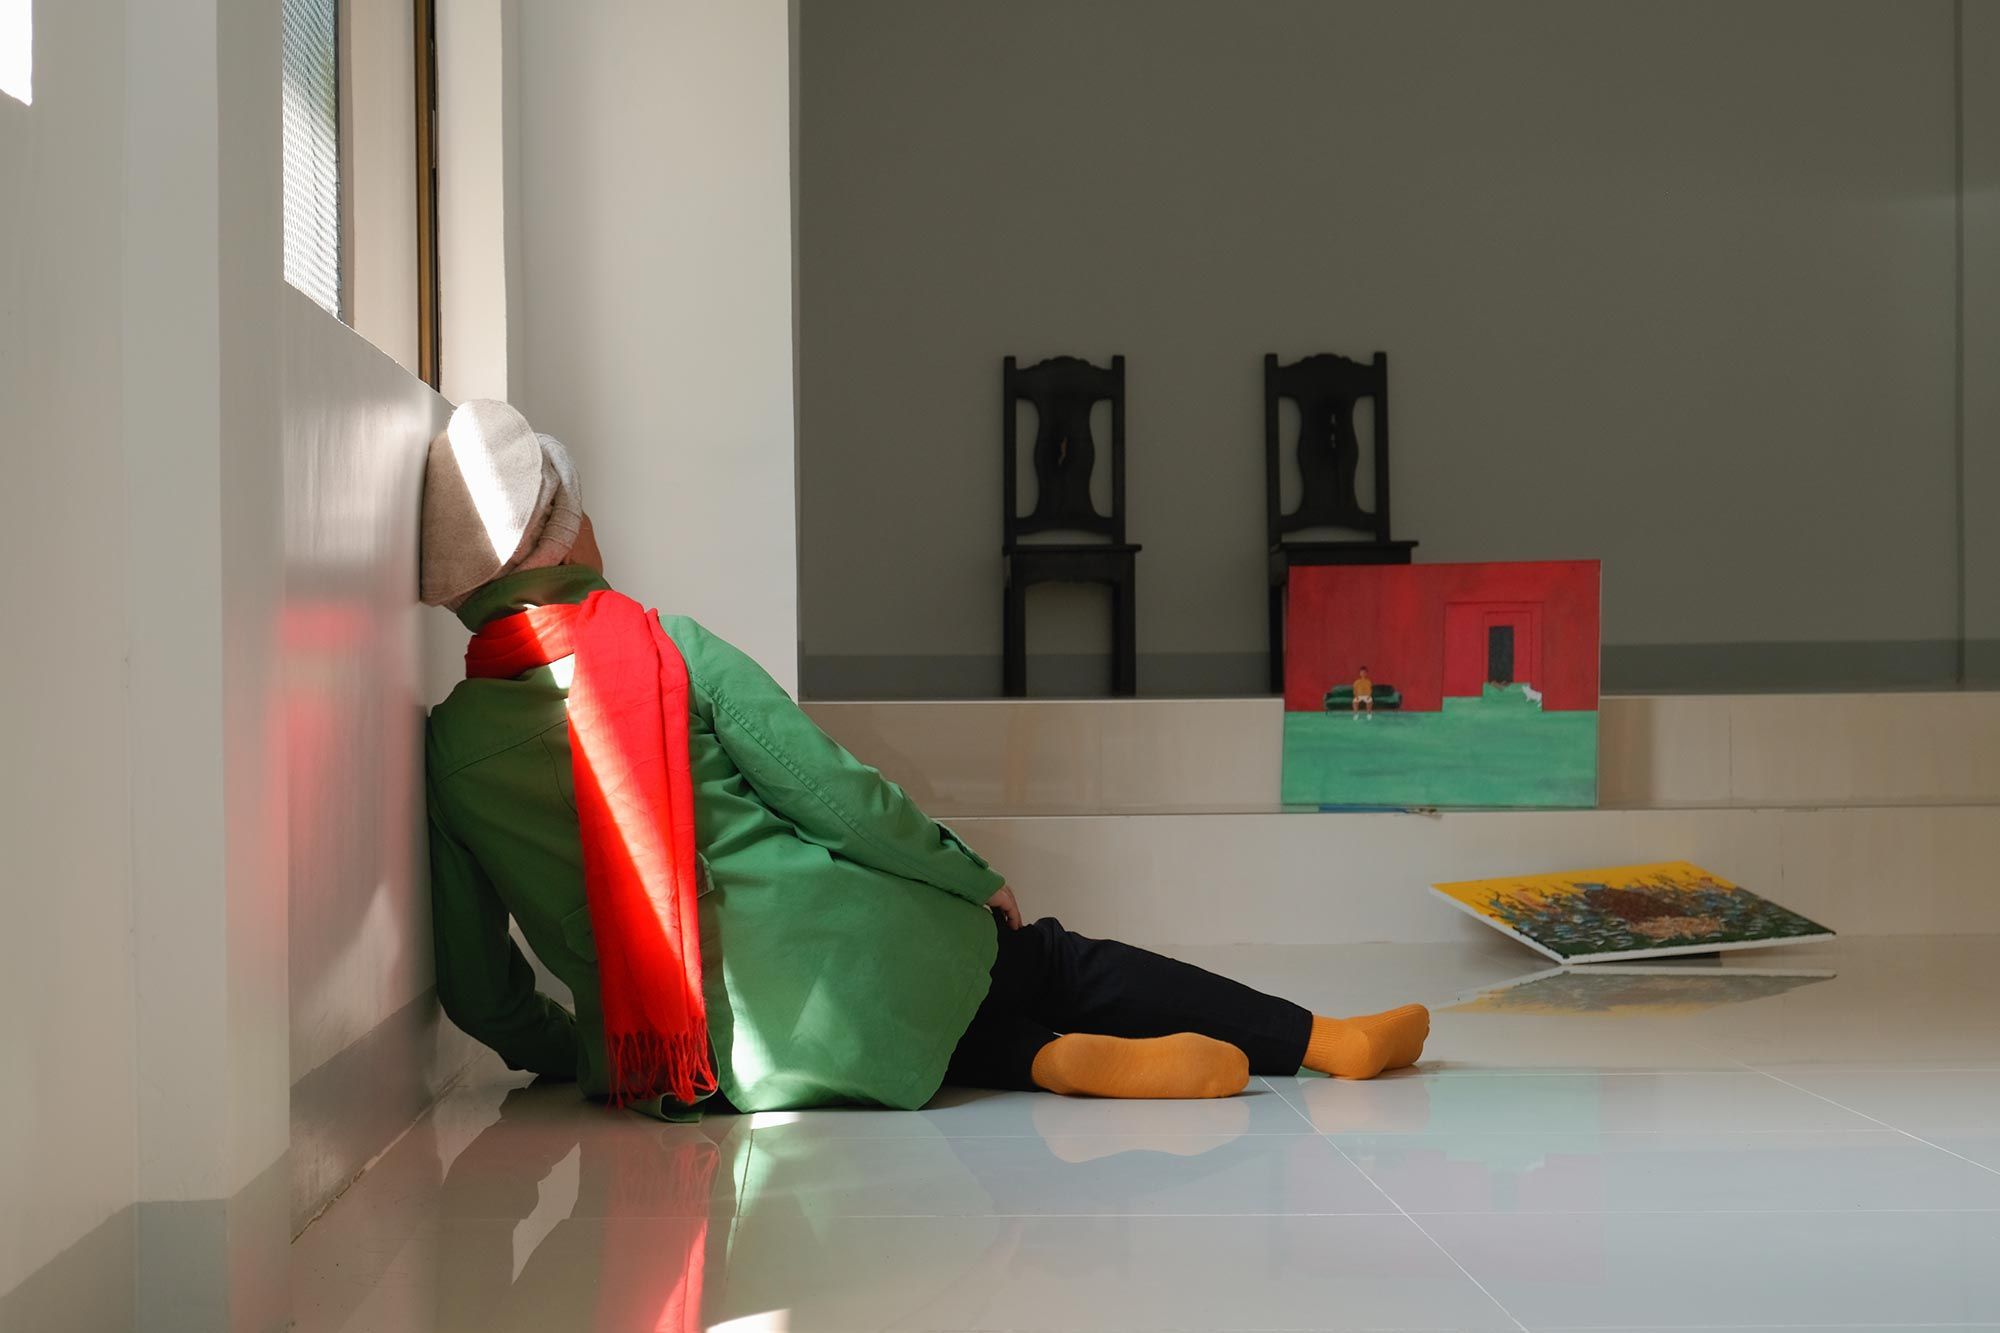 9_Breech-Asher-Harani--Sedentary-Inexistence